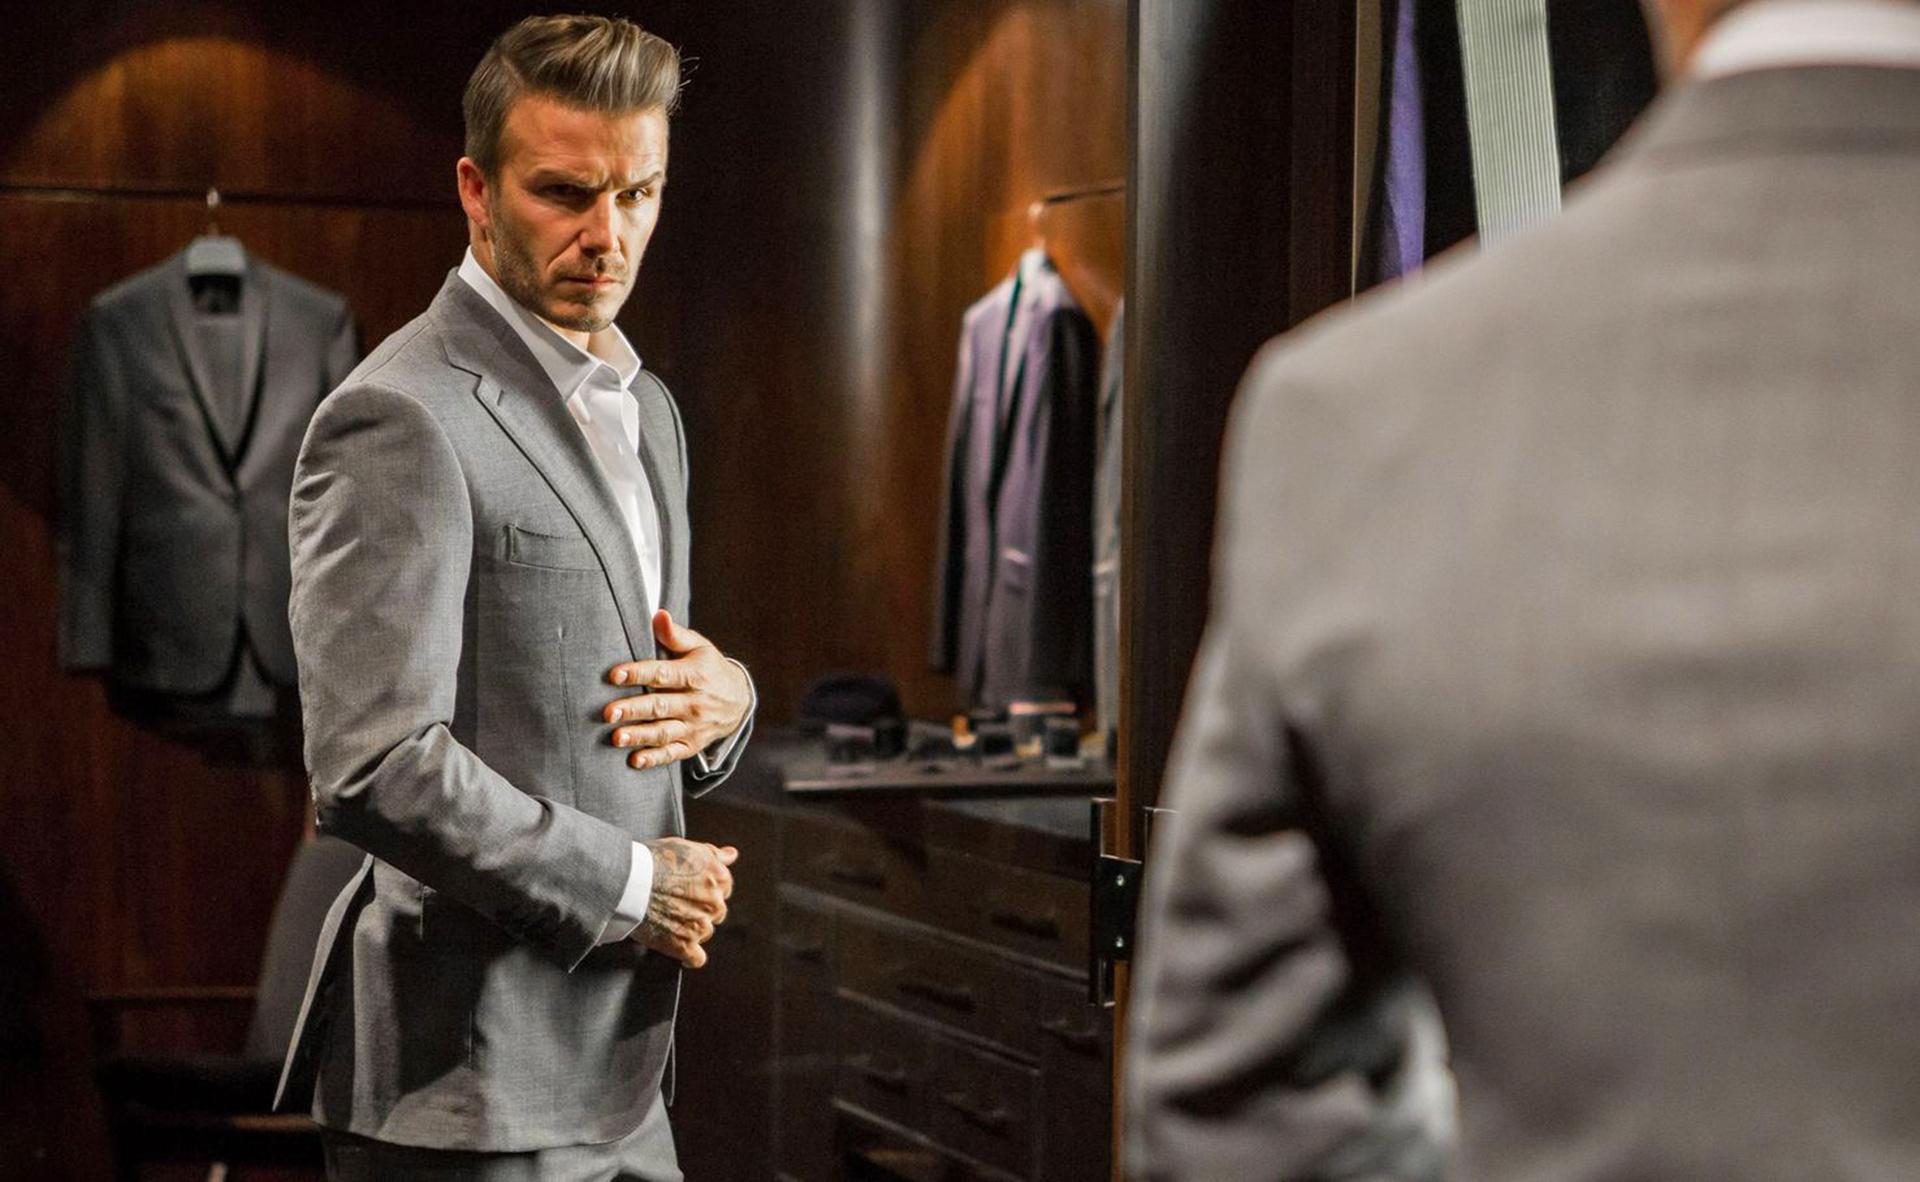 David Beckham wearing a light-grey suit